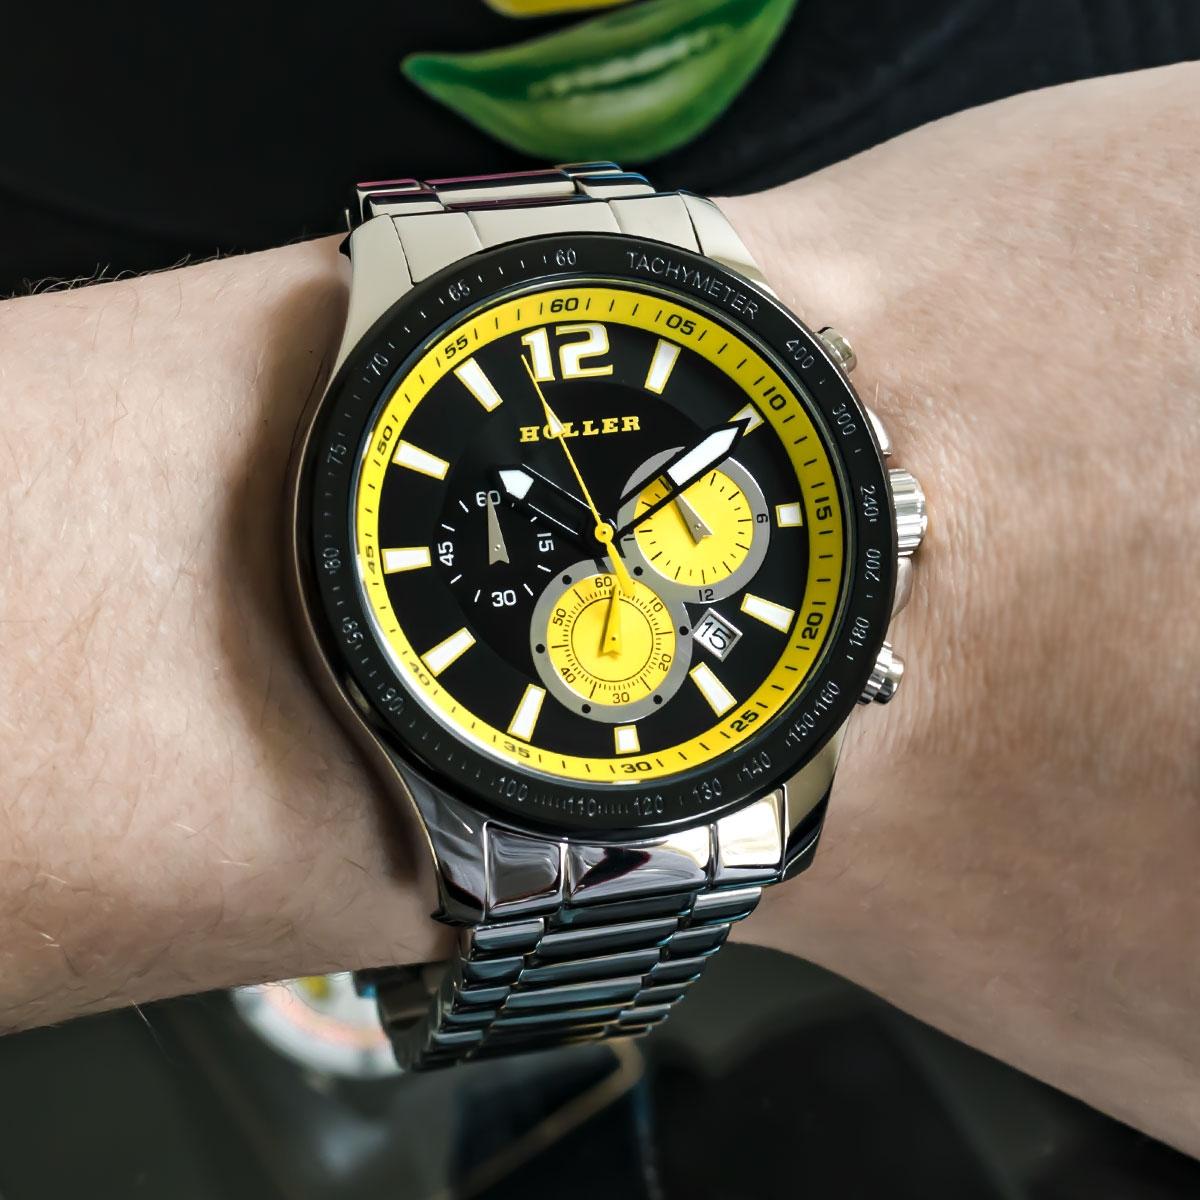 Invictus Yellow Watch